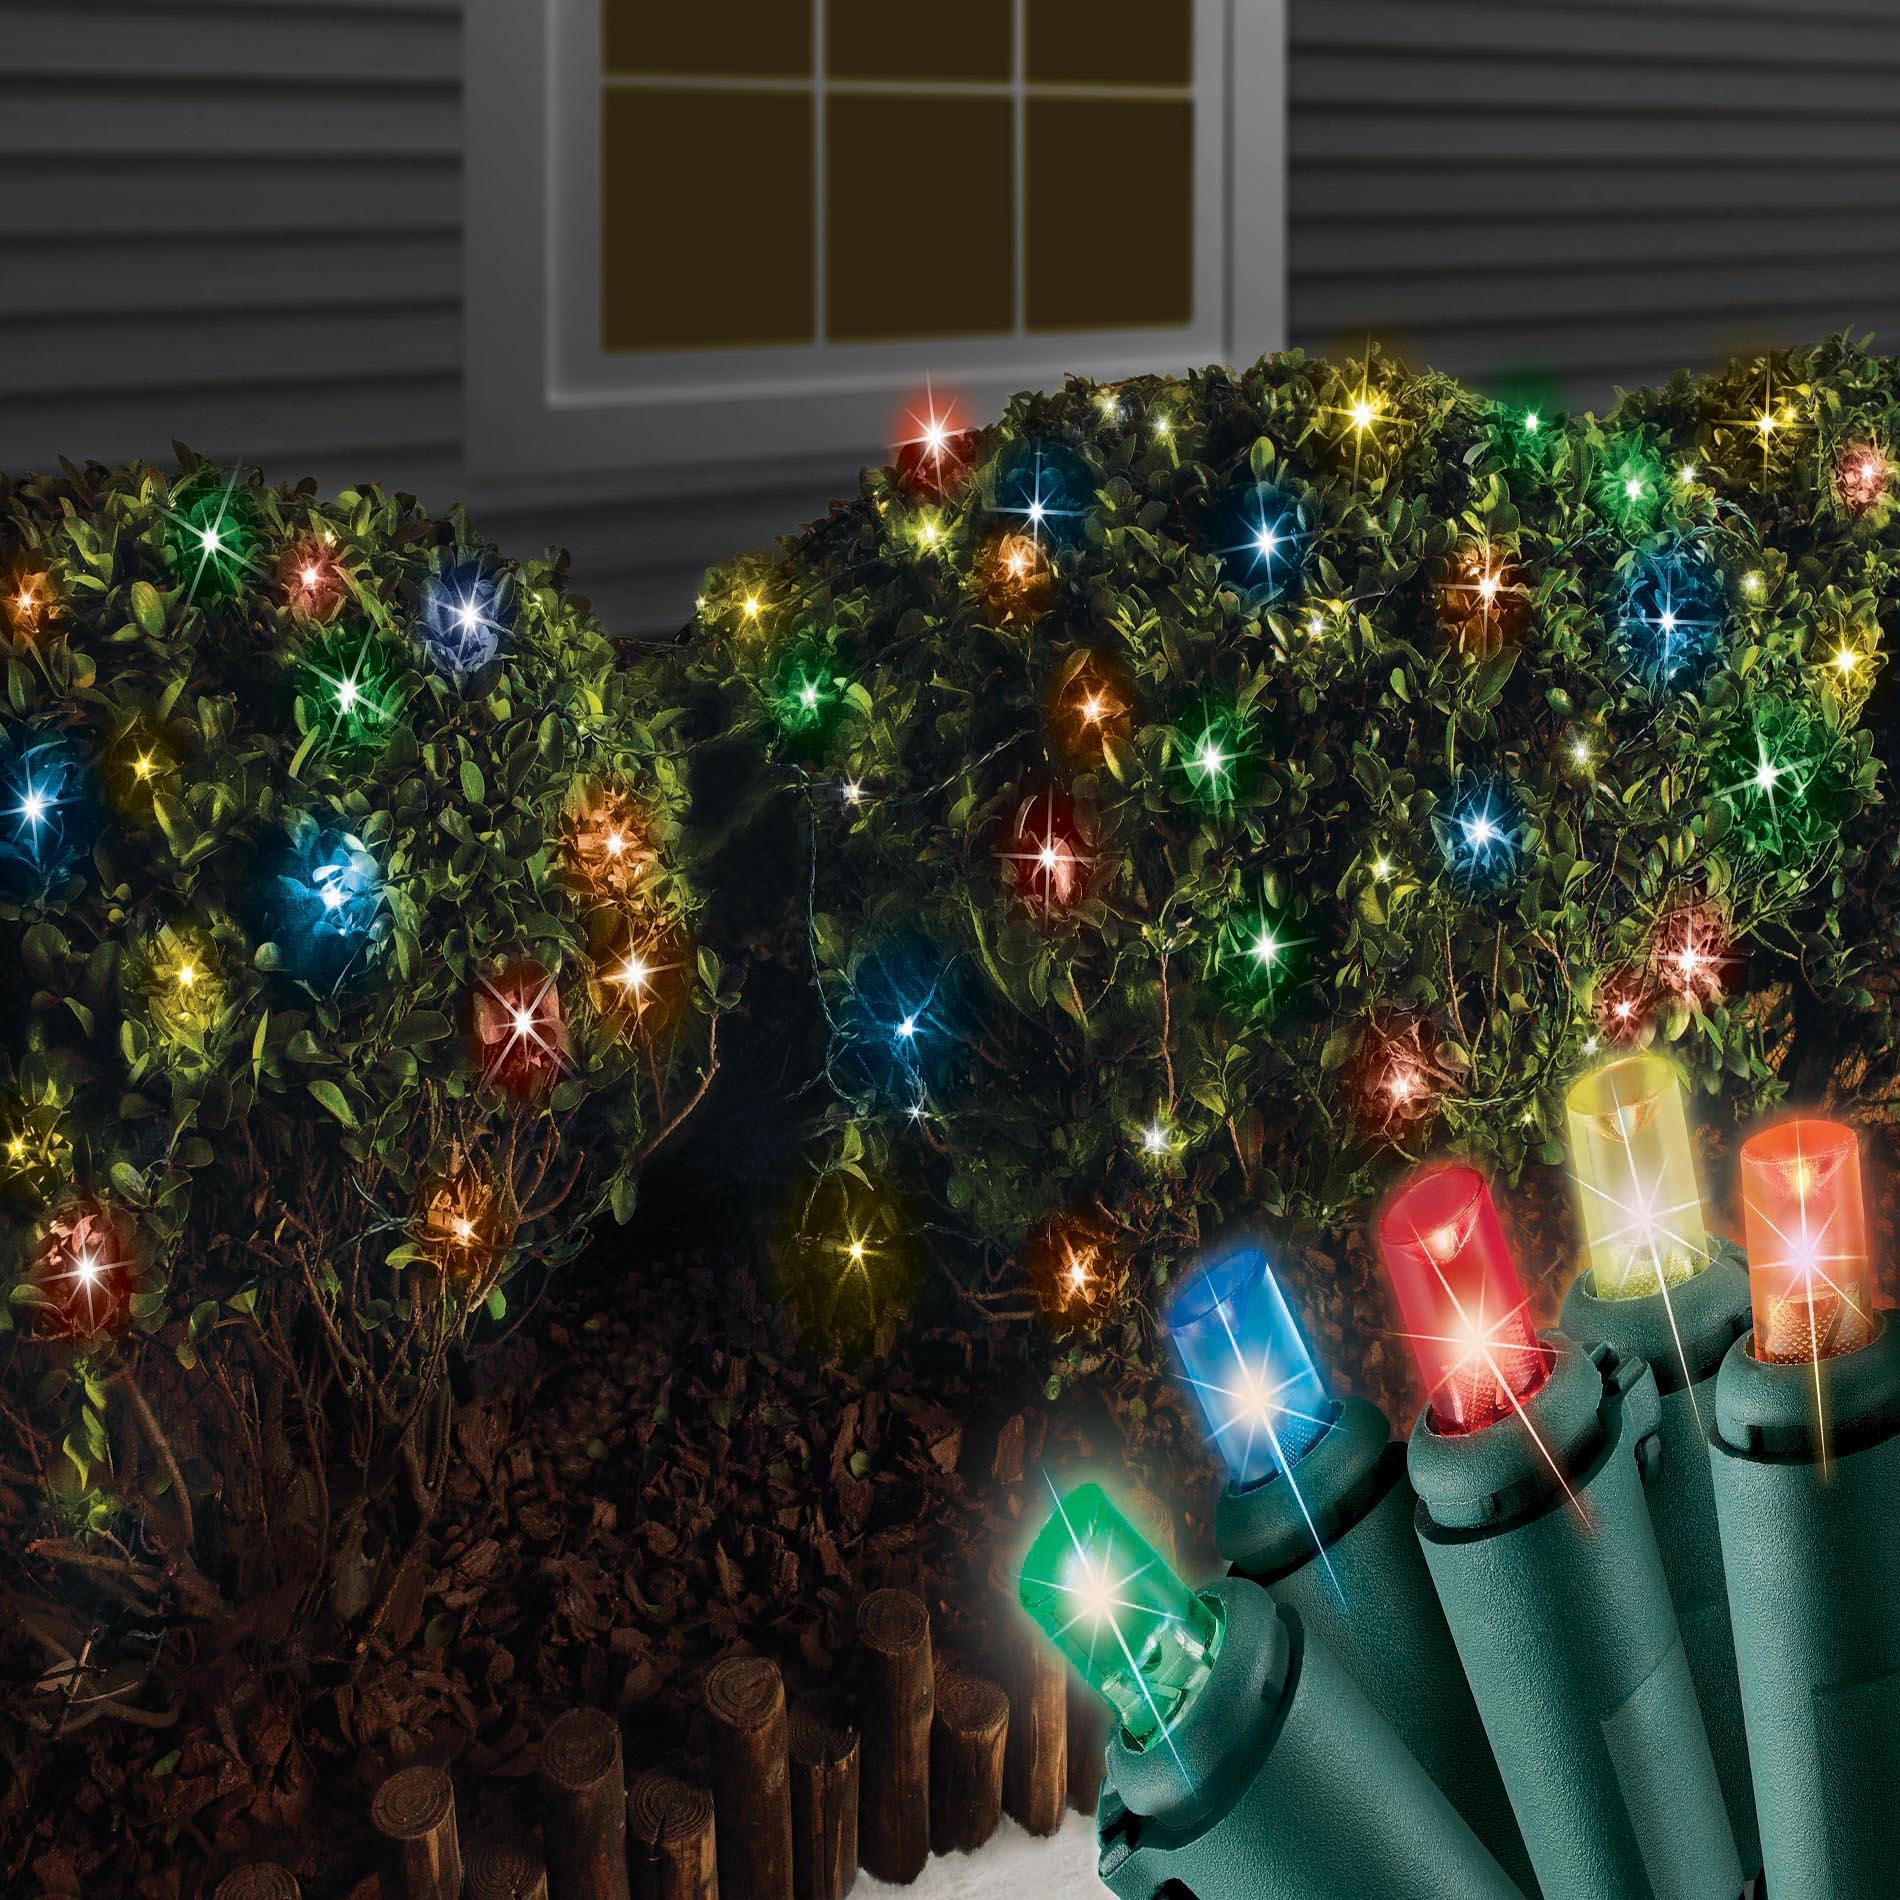 trim a home led 100ct net christmas lights multi colored - Christmas Lights Net